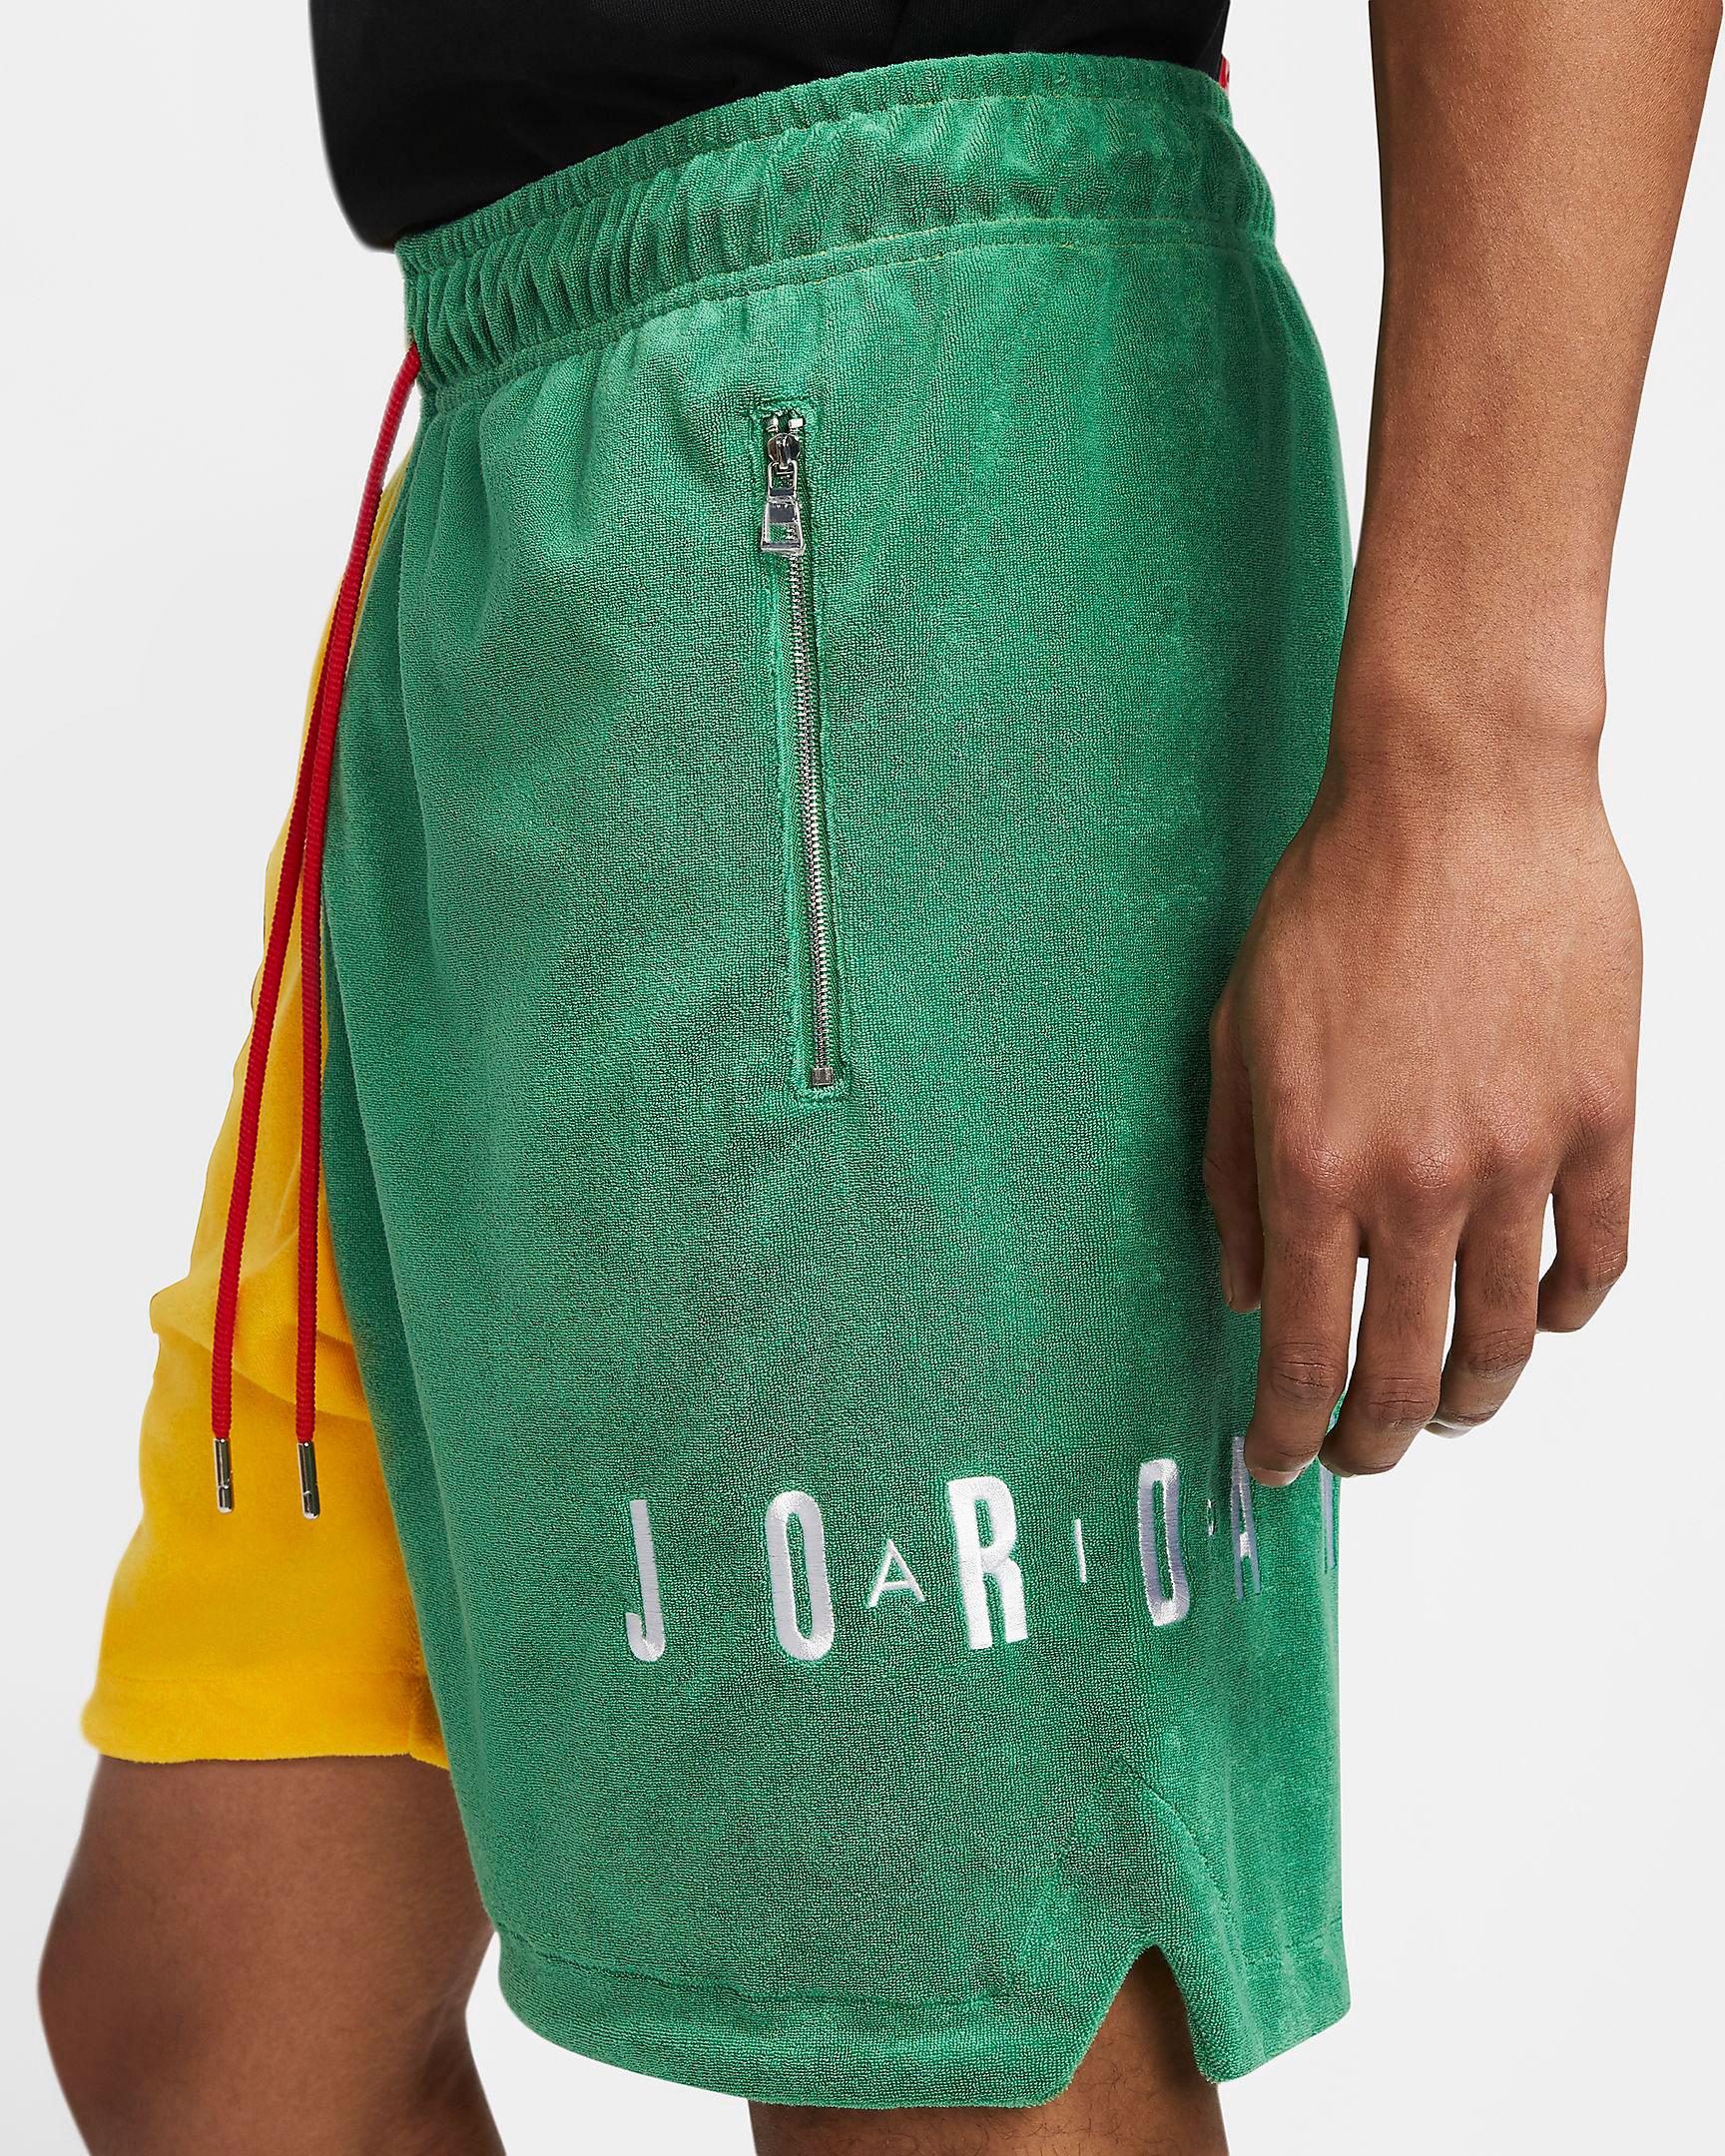 shorts-to-match-jordan-6-hare-2